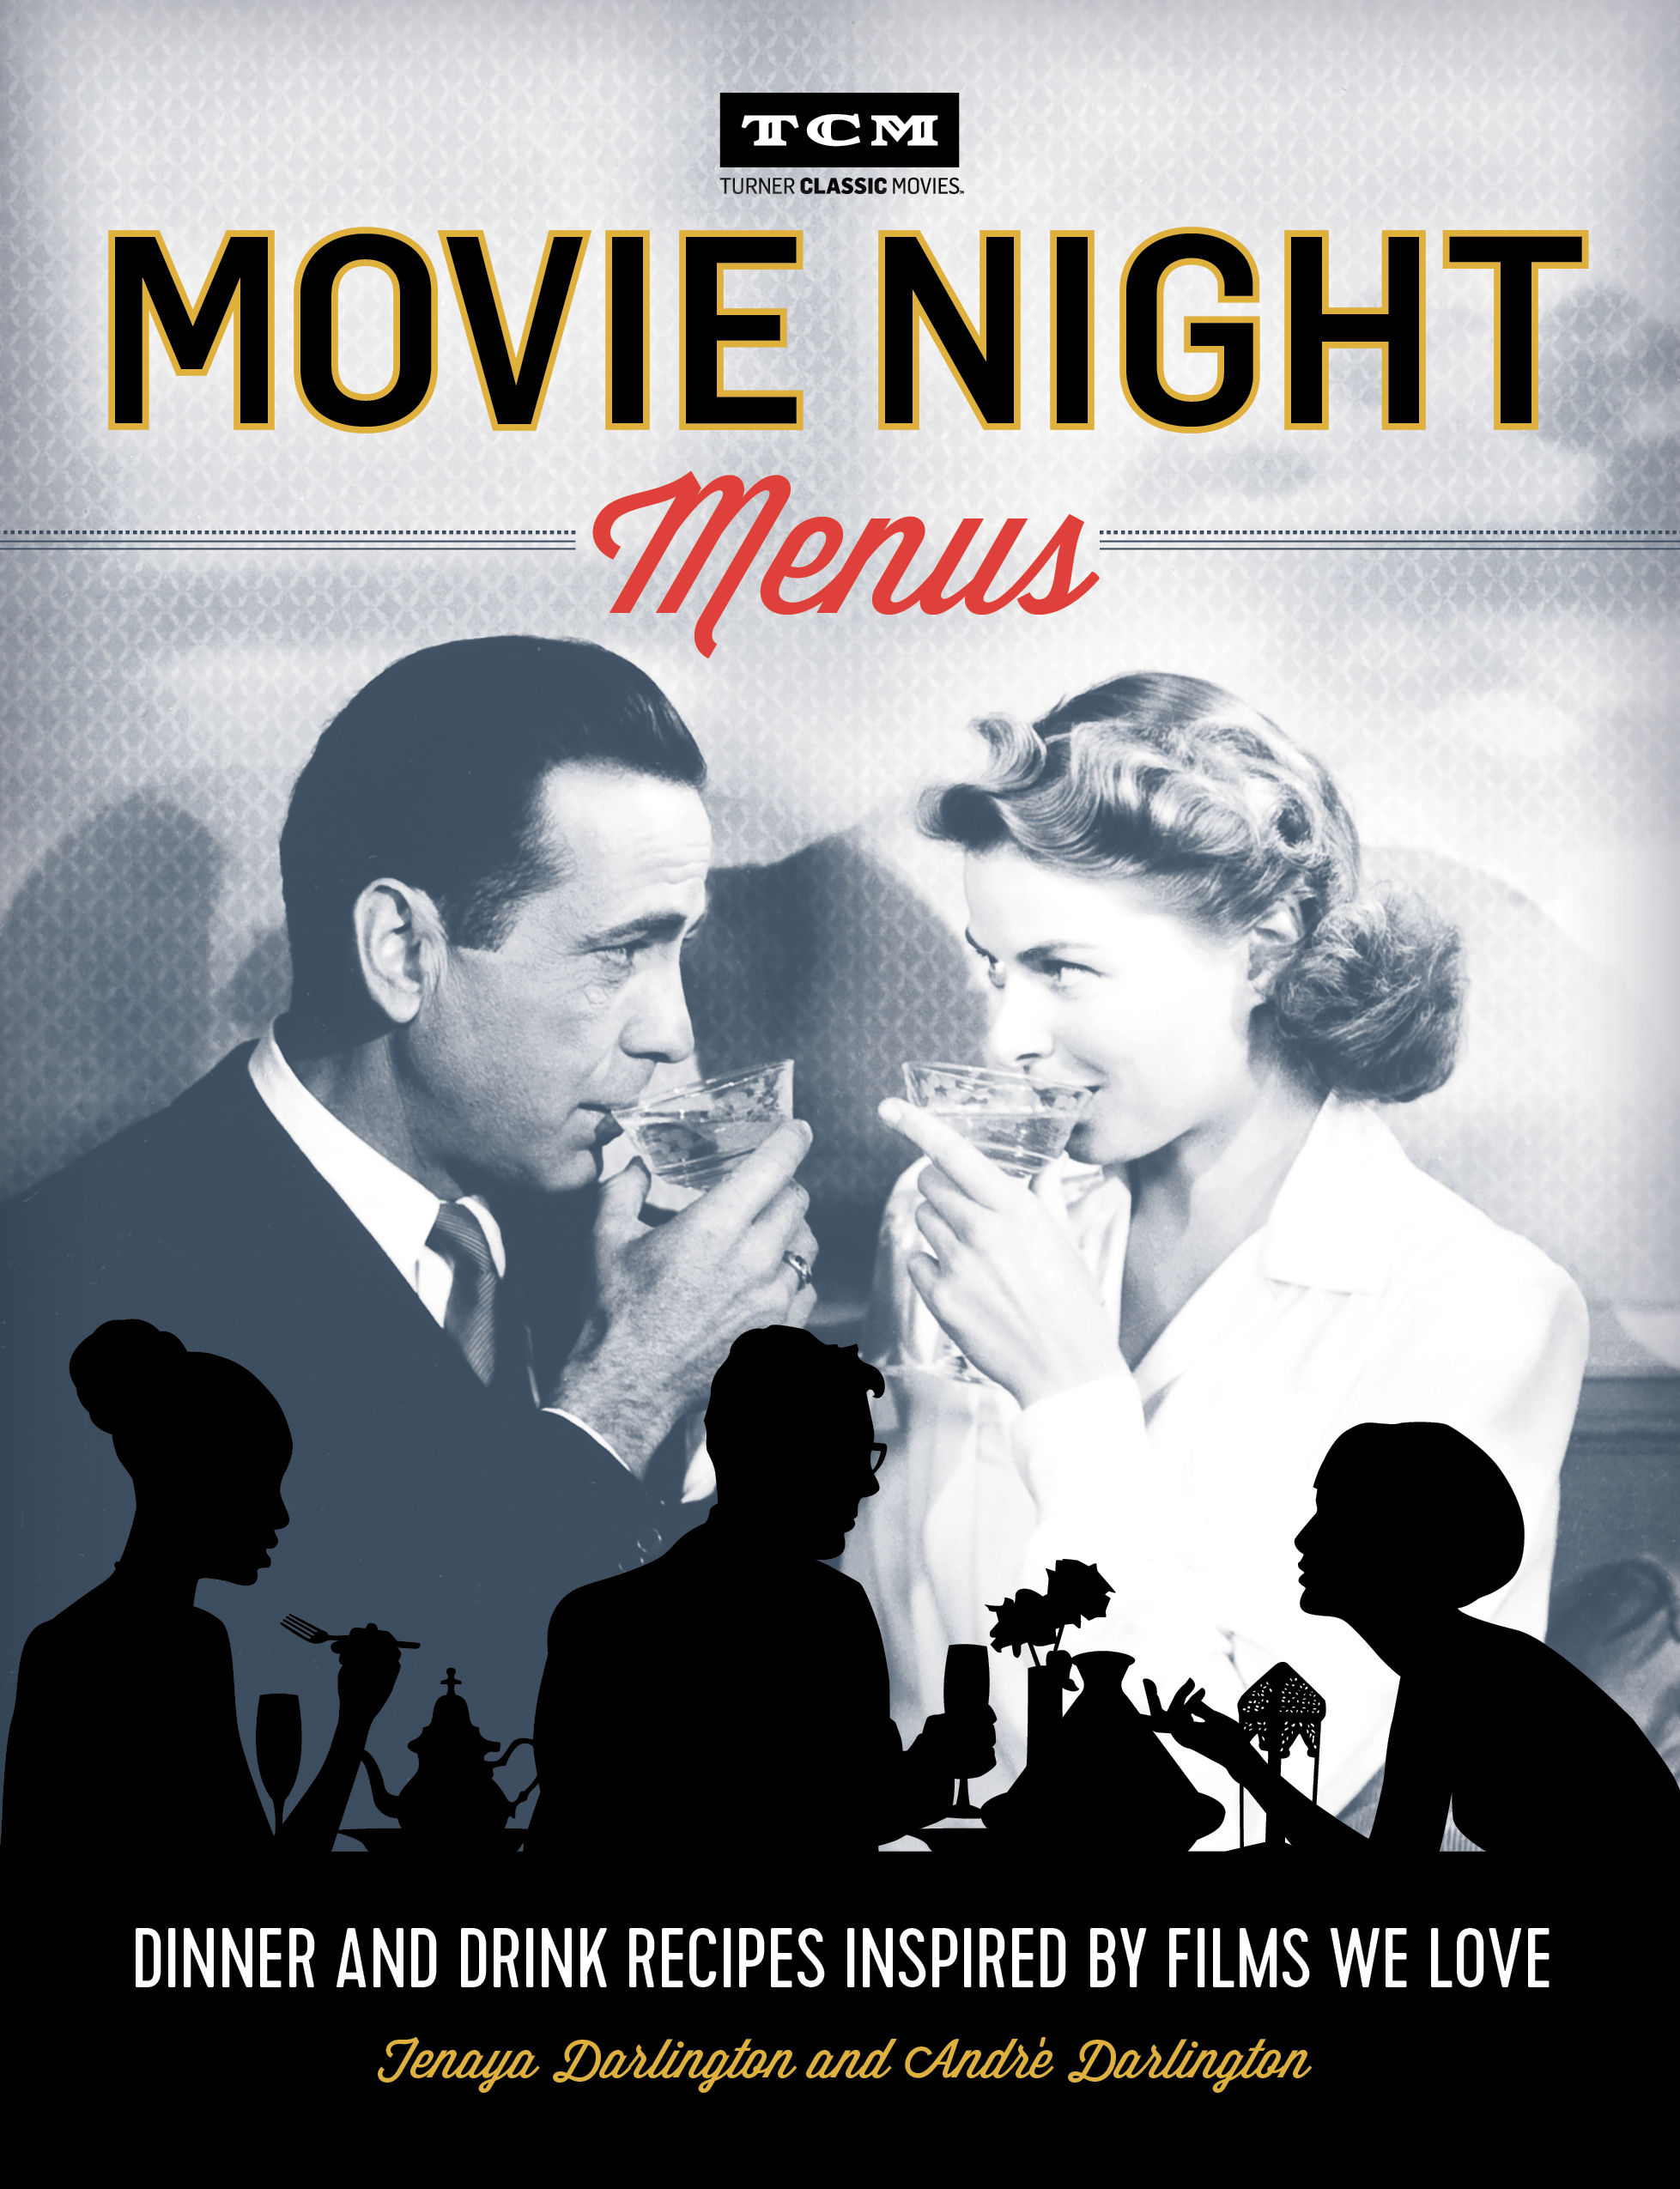 Movie Night Menus Cover Image by Tenaya Darlington and Andre Darlington